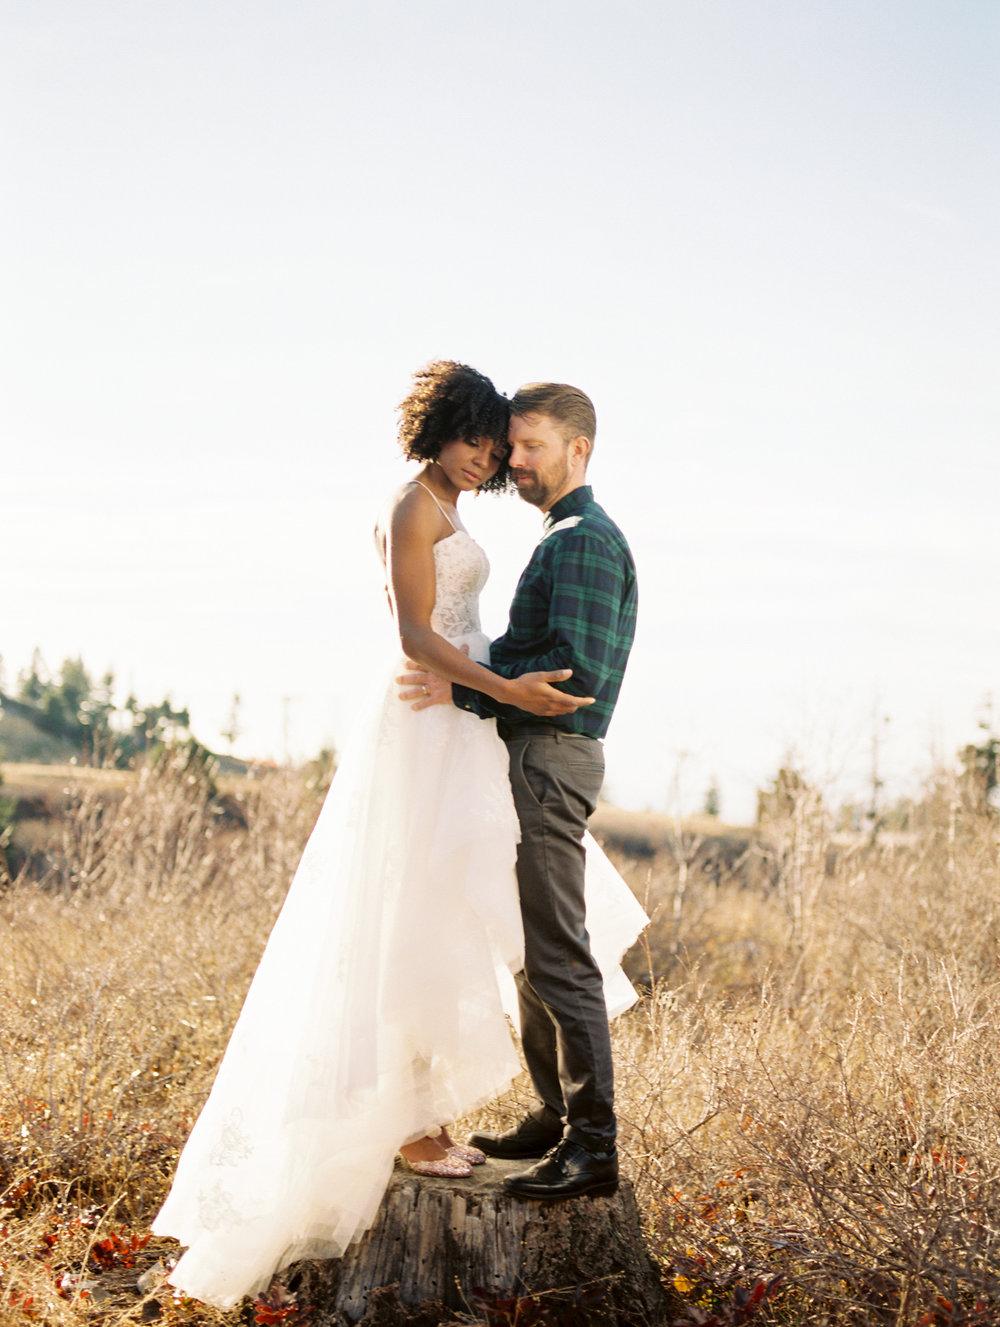 Ben+Joella_Marriage_34.jpg